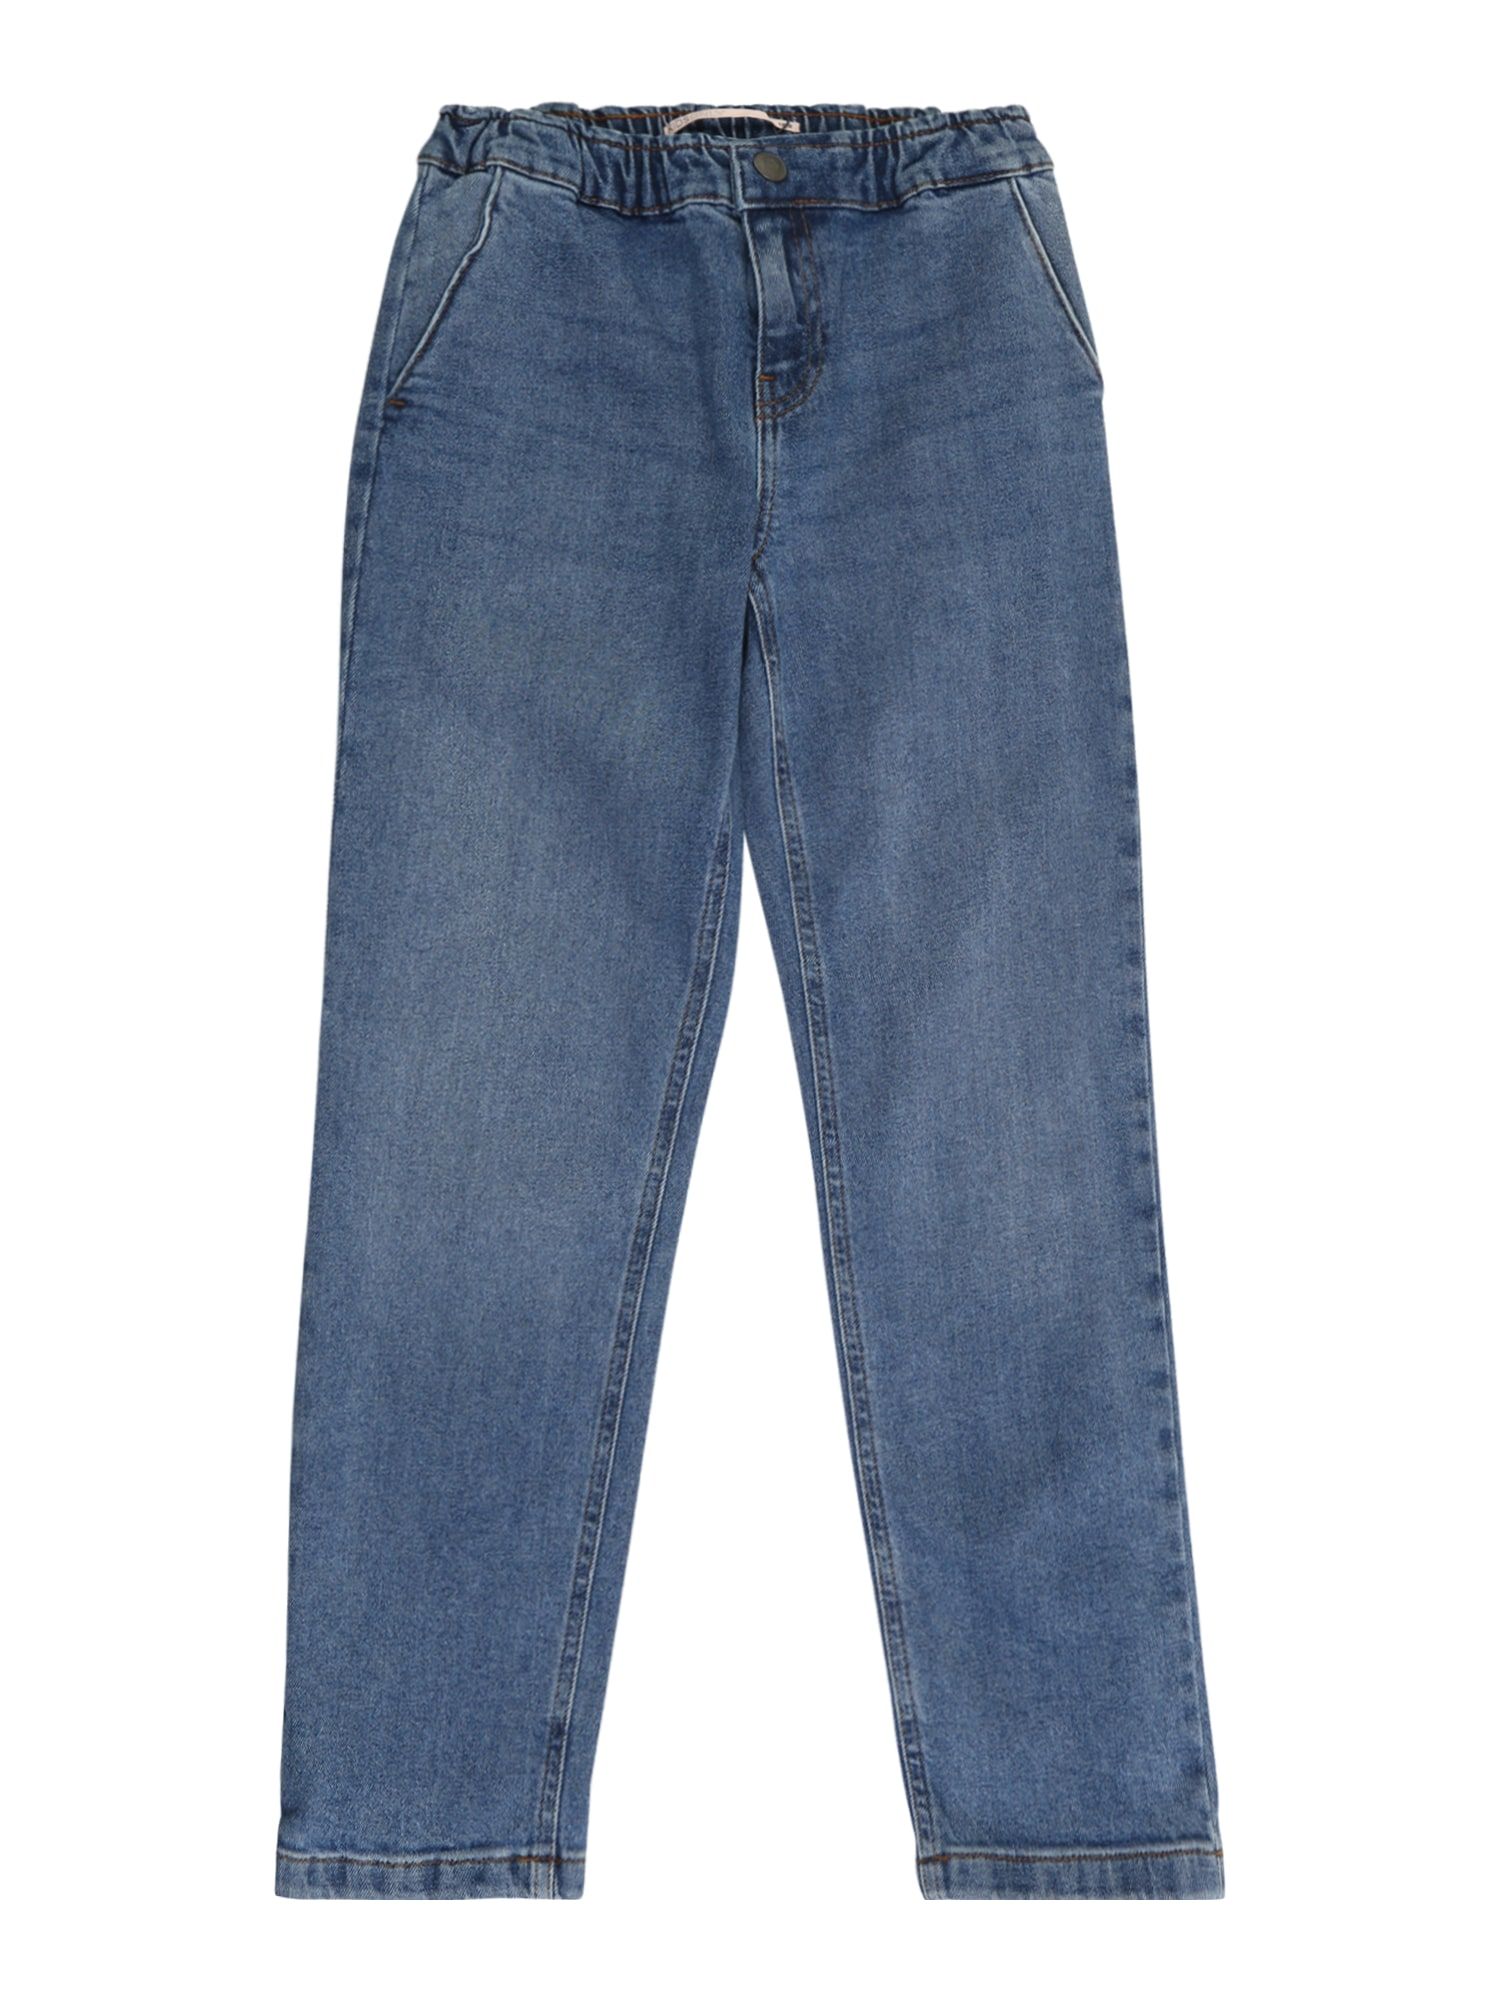 KIDS ONLY Džinsai 'Skyler' tamsiai (džinso) mėlyna